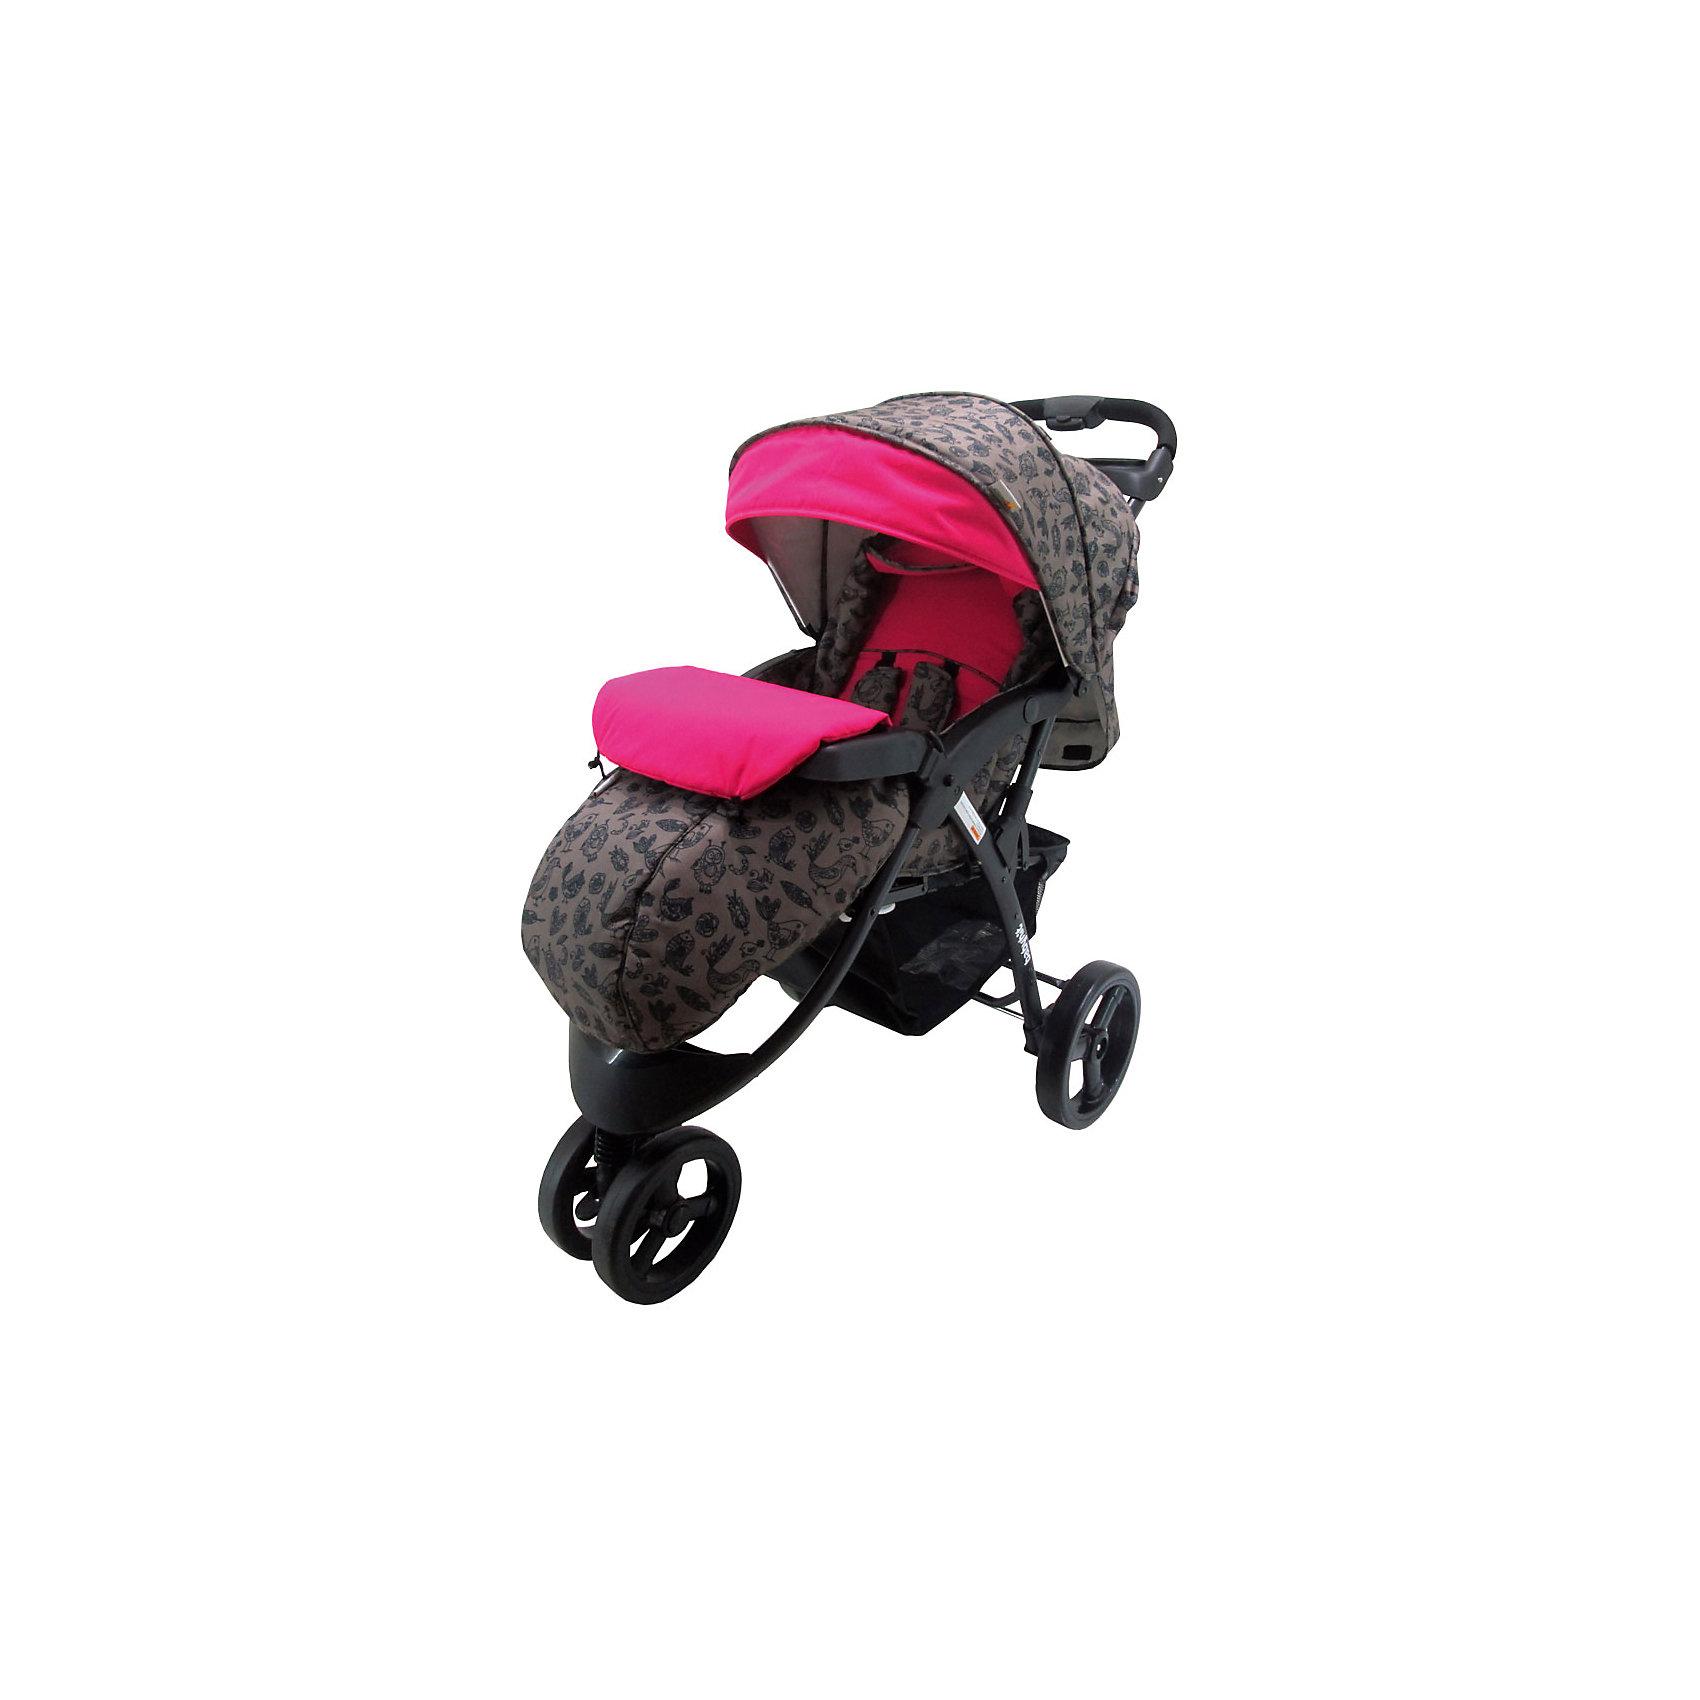 Baby Hit Прогулочная коляска Voyage, BIRDS, Baby Hit, розовый прогулочная коляска cool baby kdd 6795dc 1 green